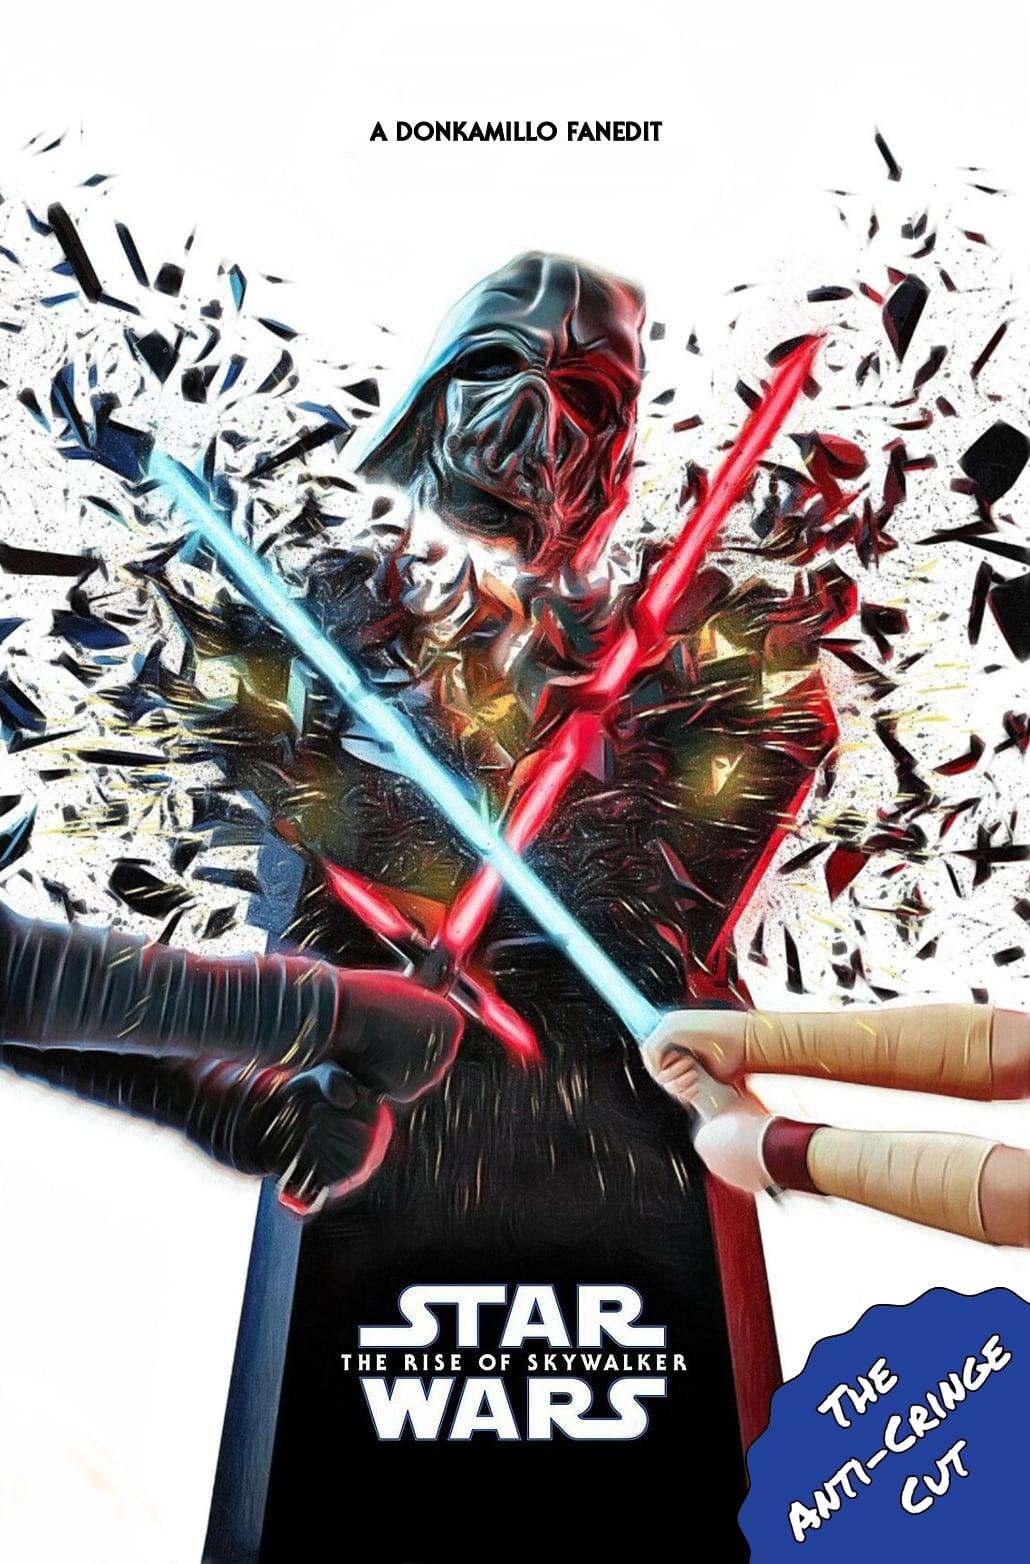 Star Wars: Episode IX - The Rise of Skywalker: Anti-Cringe-Cut (1970)